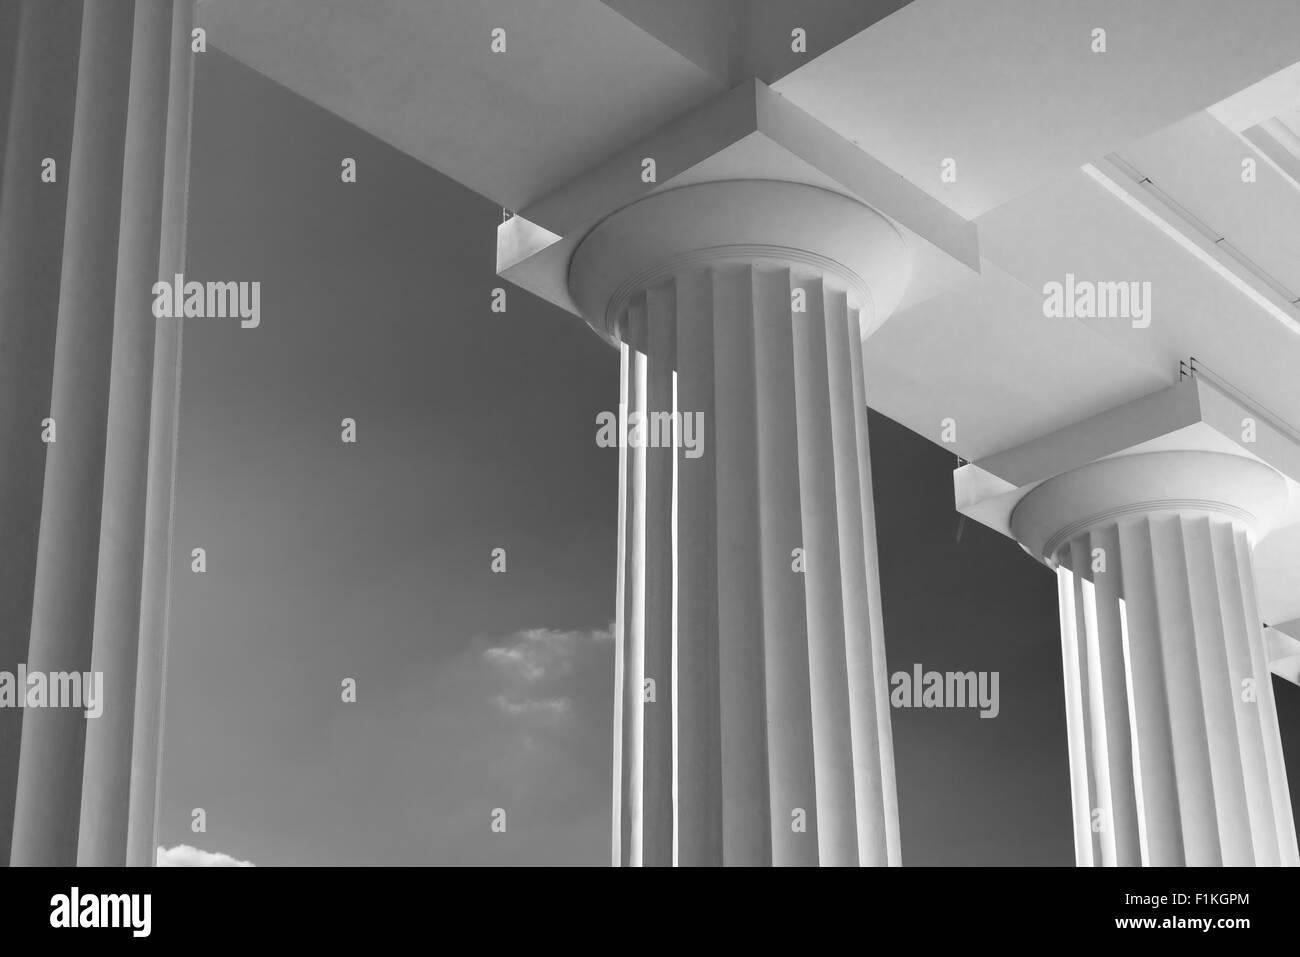 Vintage Columns Architecture Of Ancient Greek Temple - Stock Image